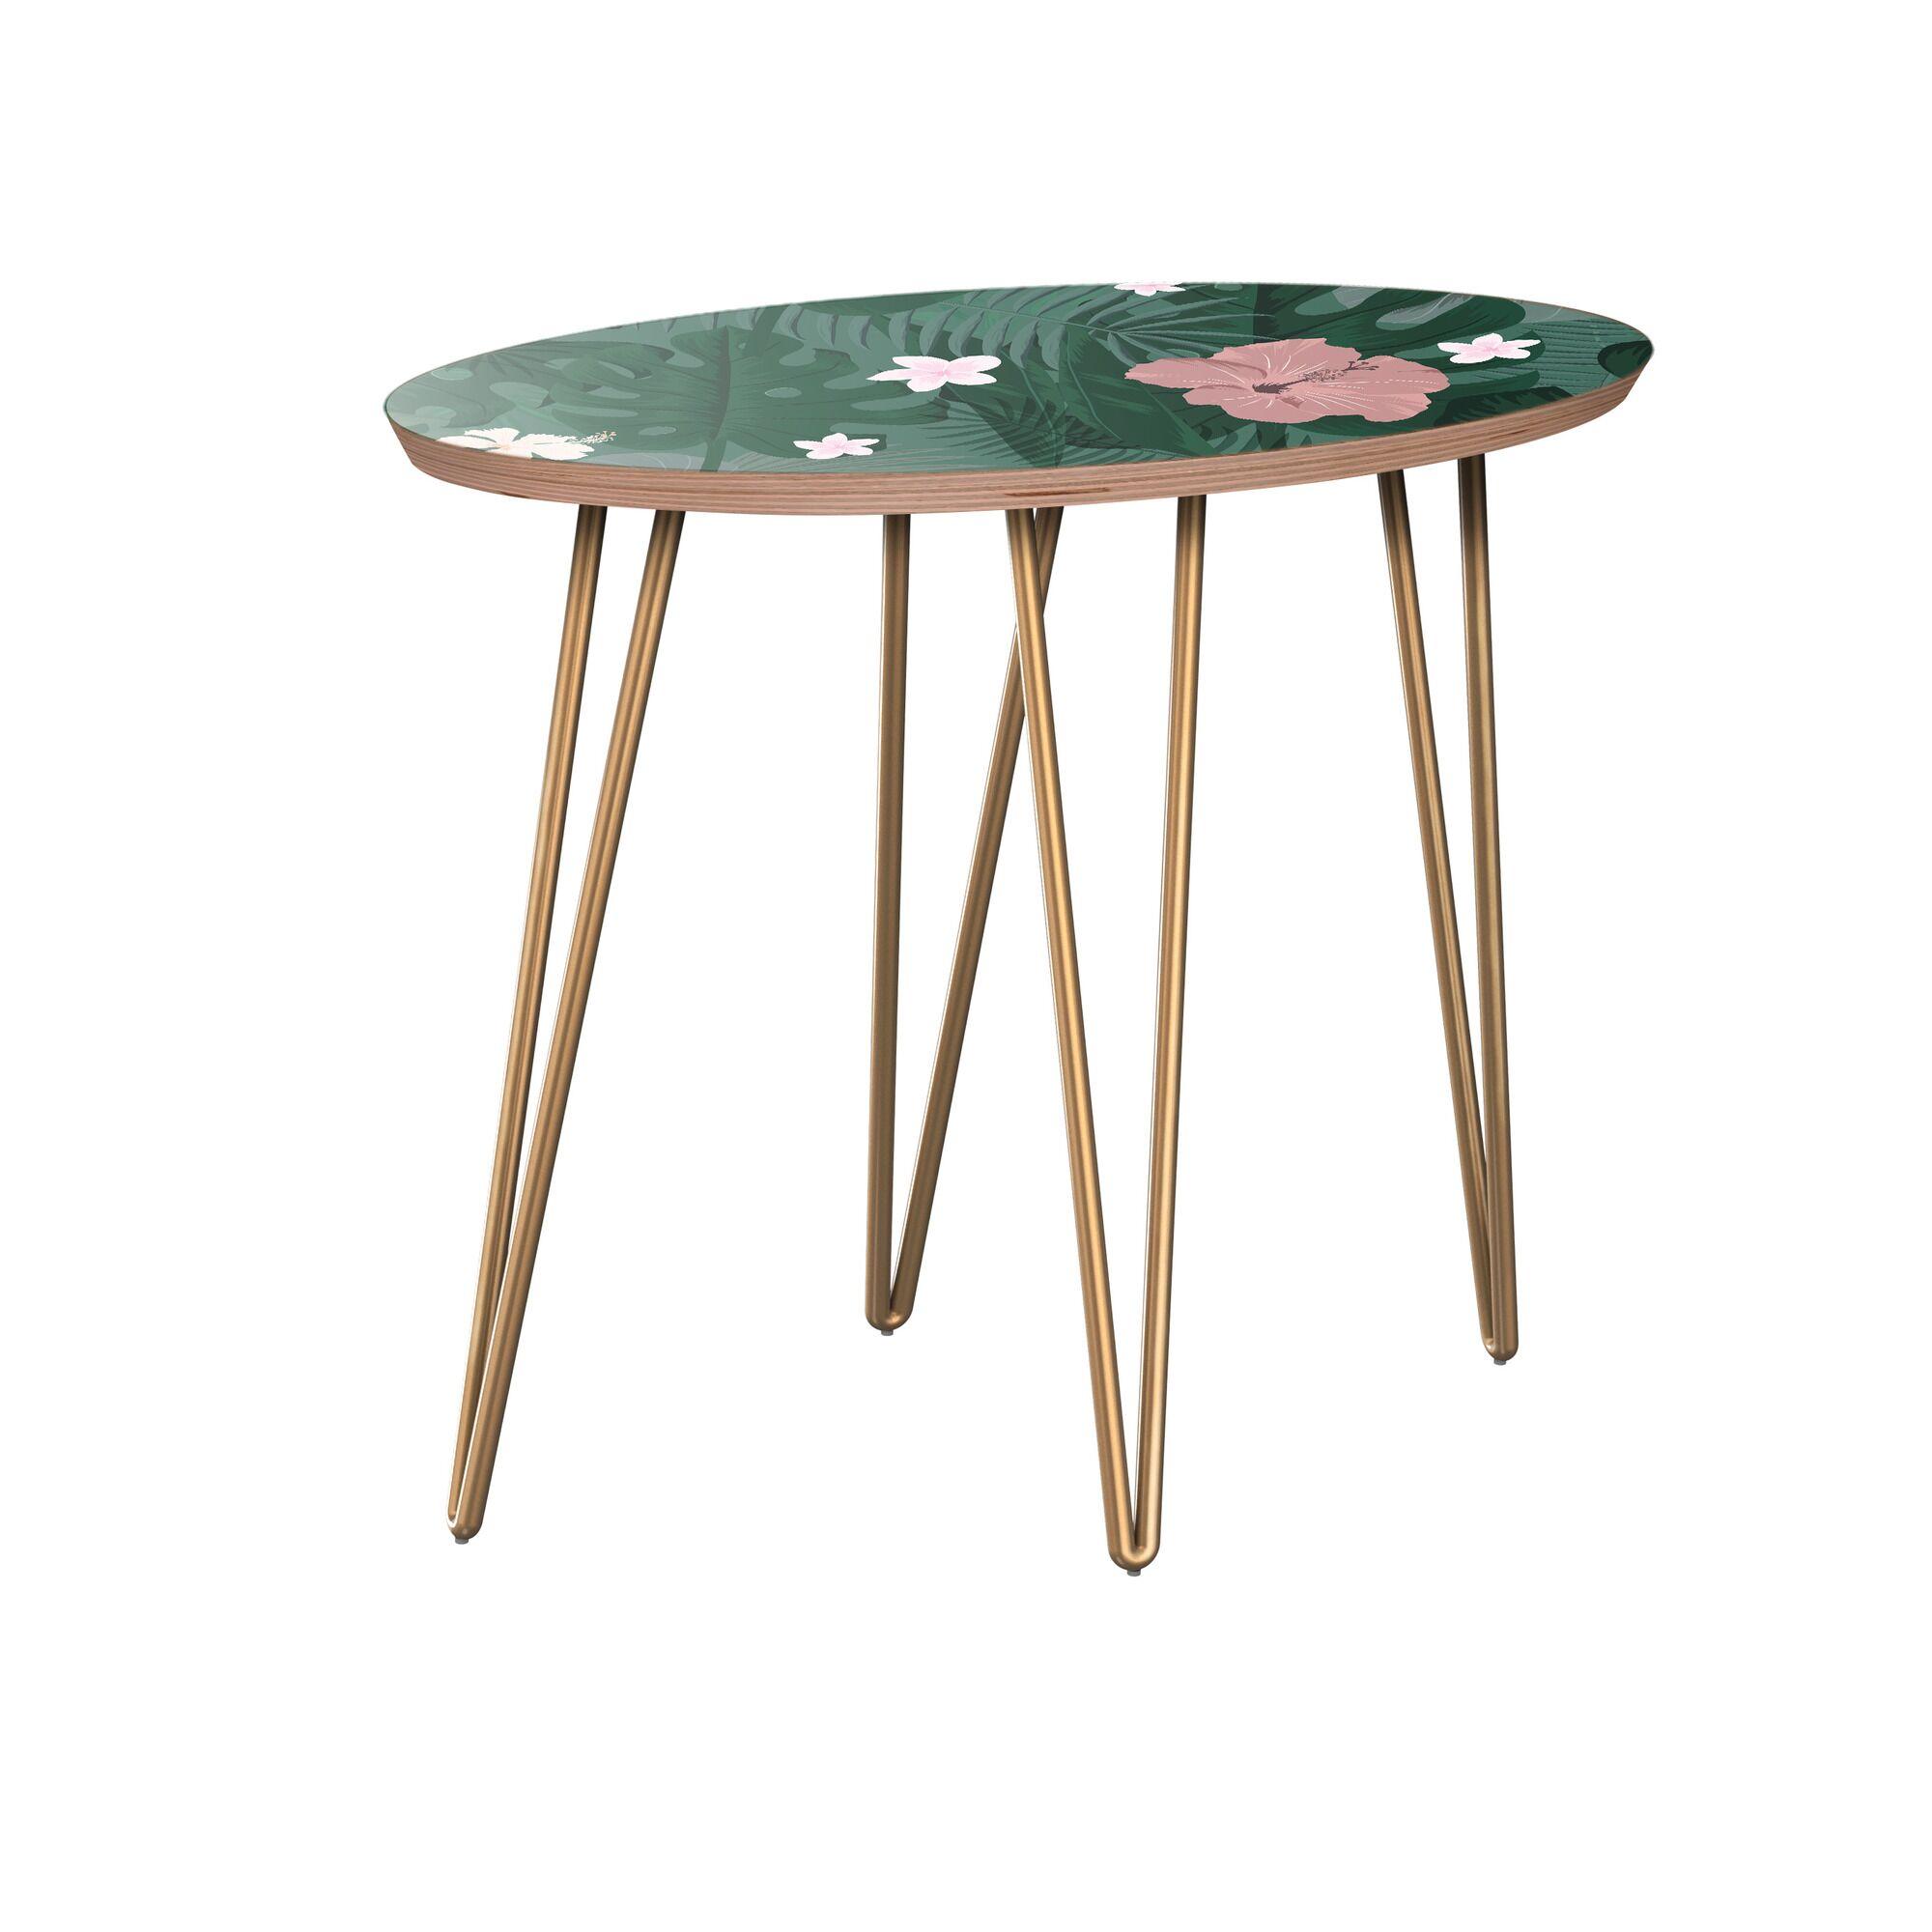 Kieve End Table Table Base Color: Brass, Table Top Color: Walnut